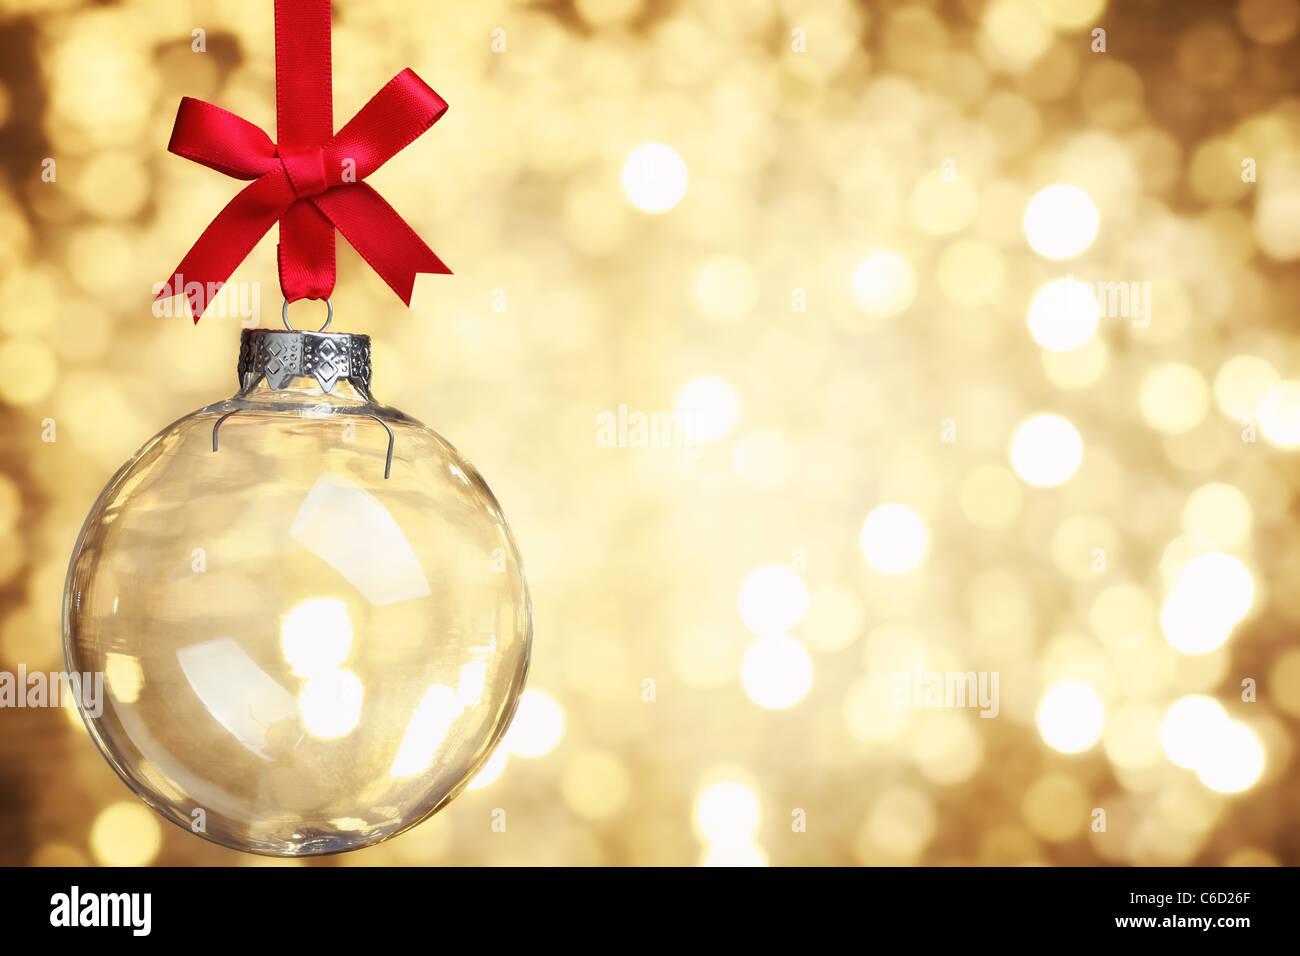 Closeup of glass Christmas ball on abstract light background. - Stock Image